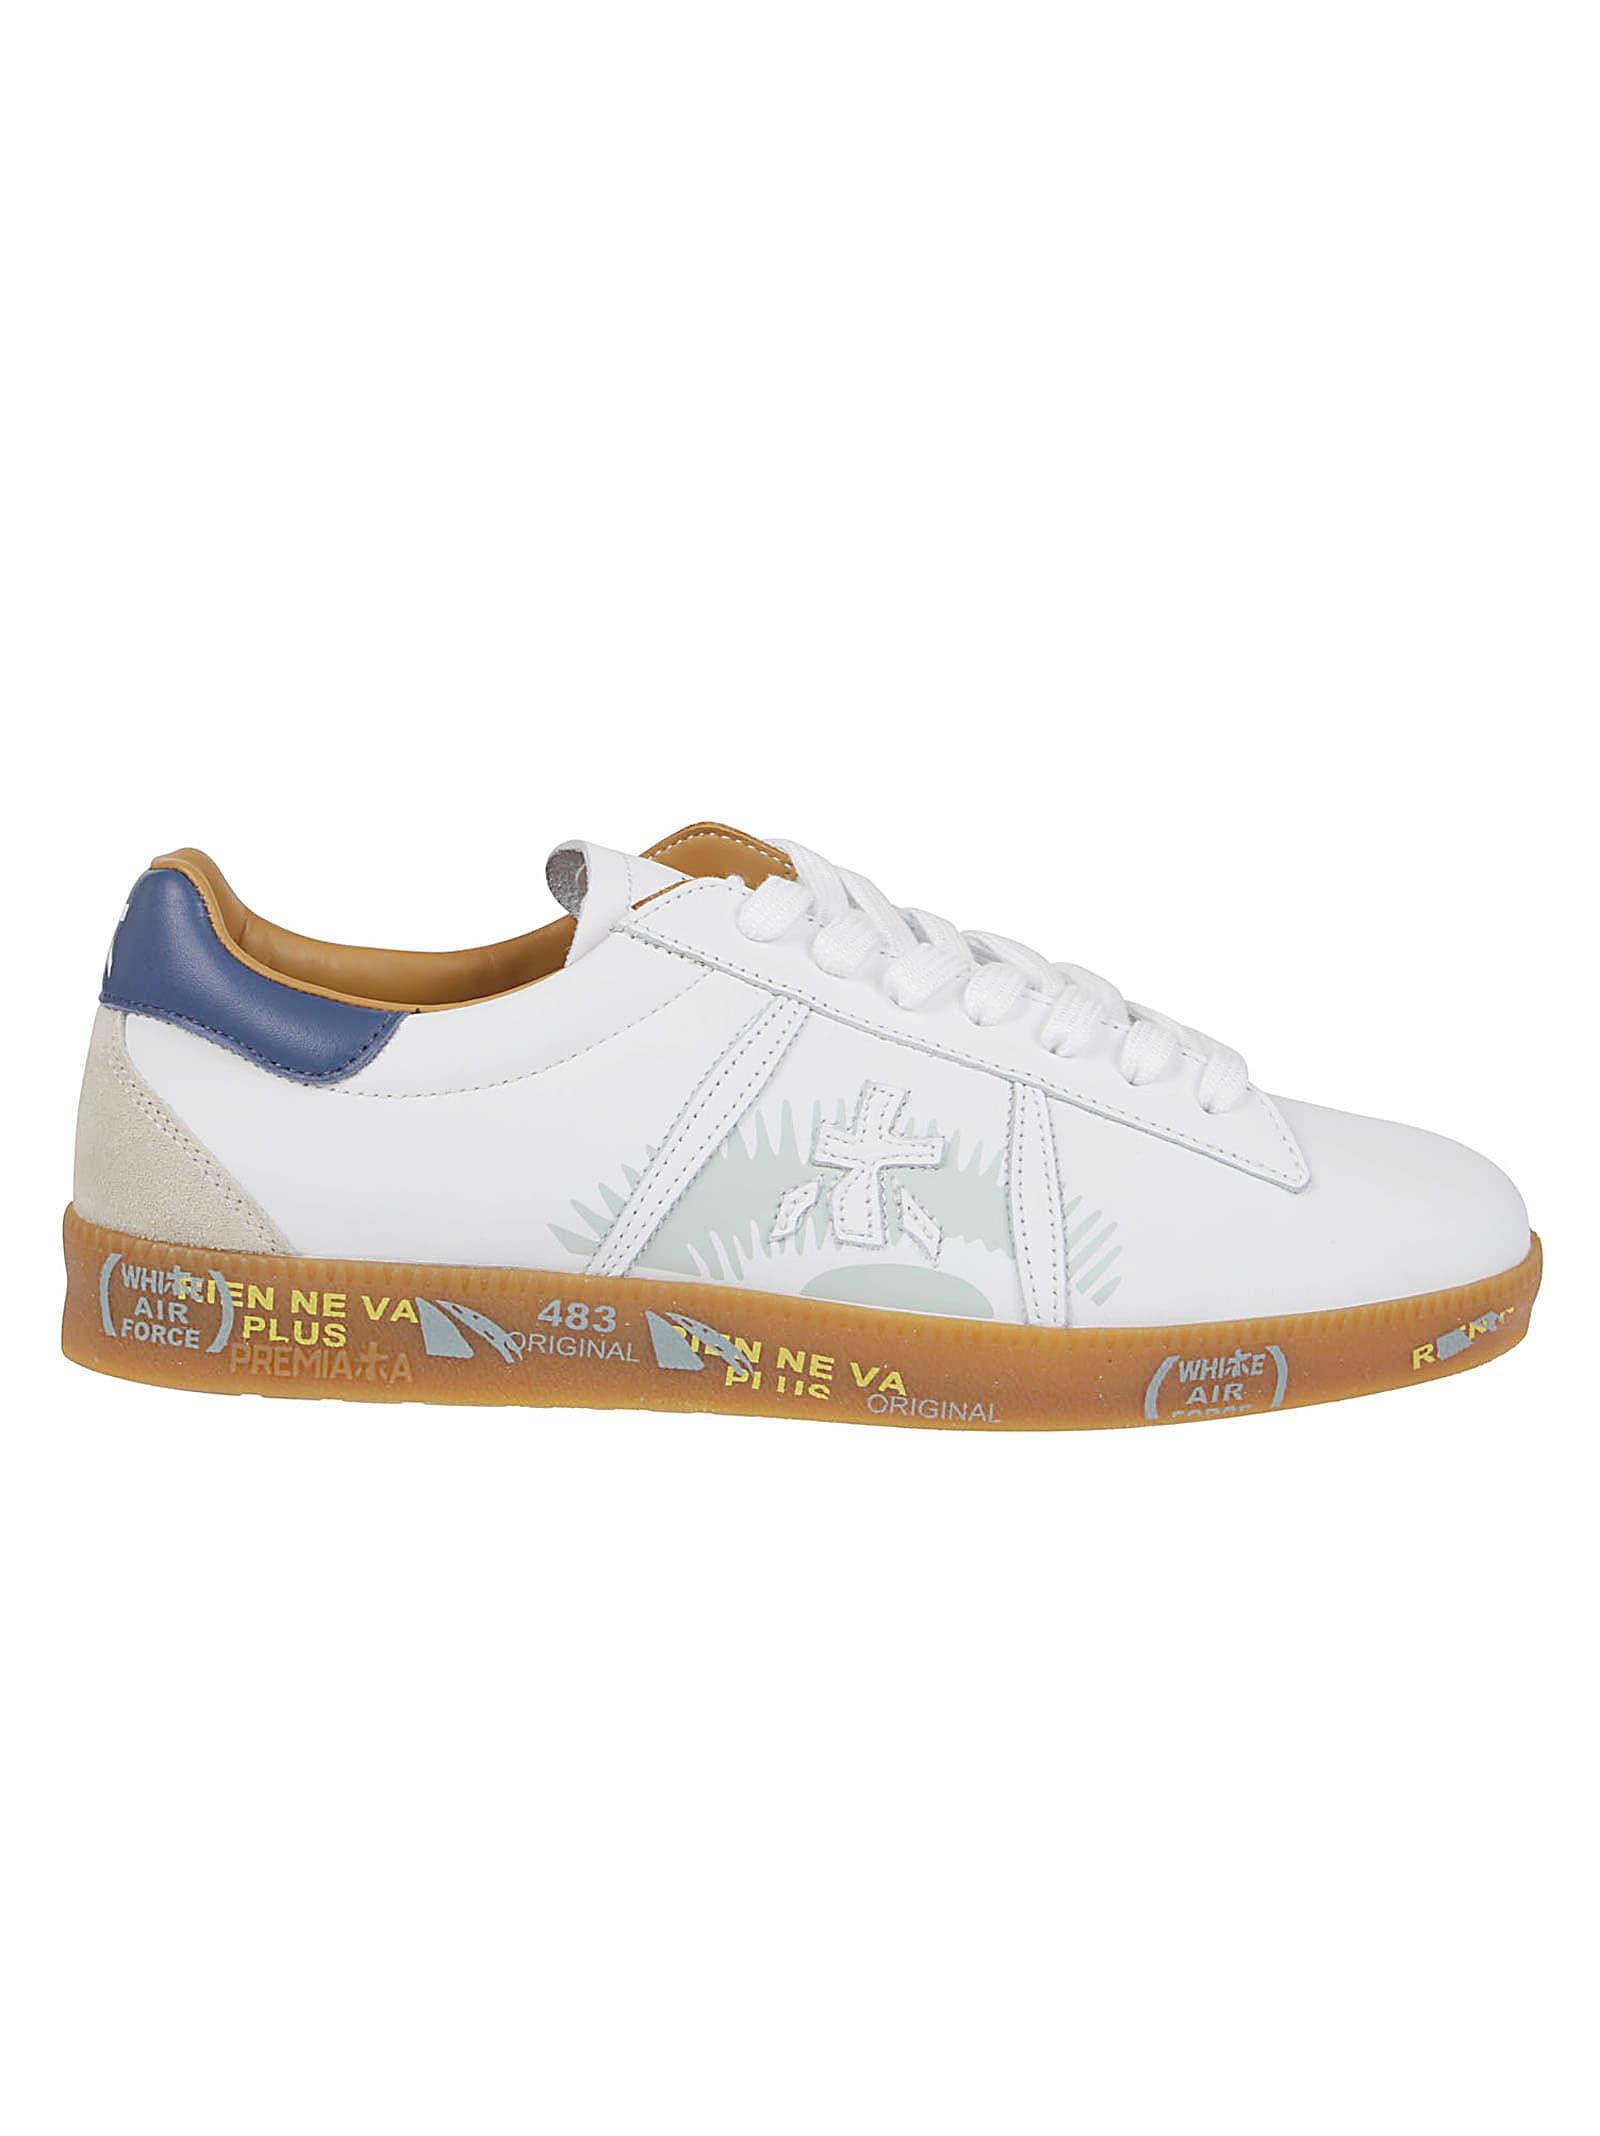 Premiata Sneakers Andy